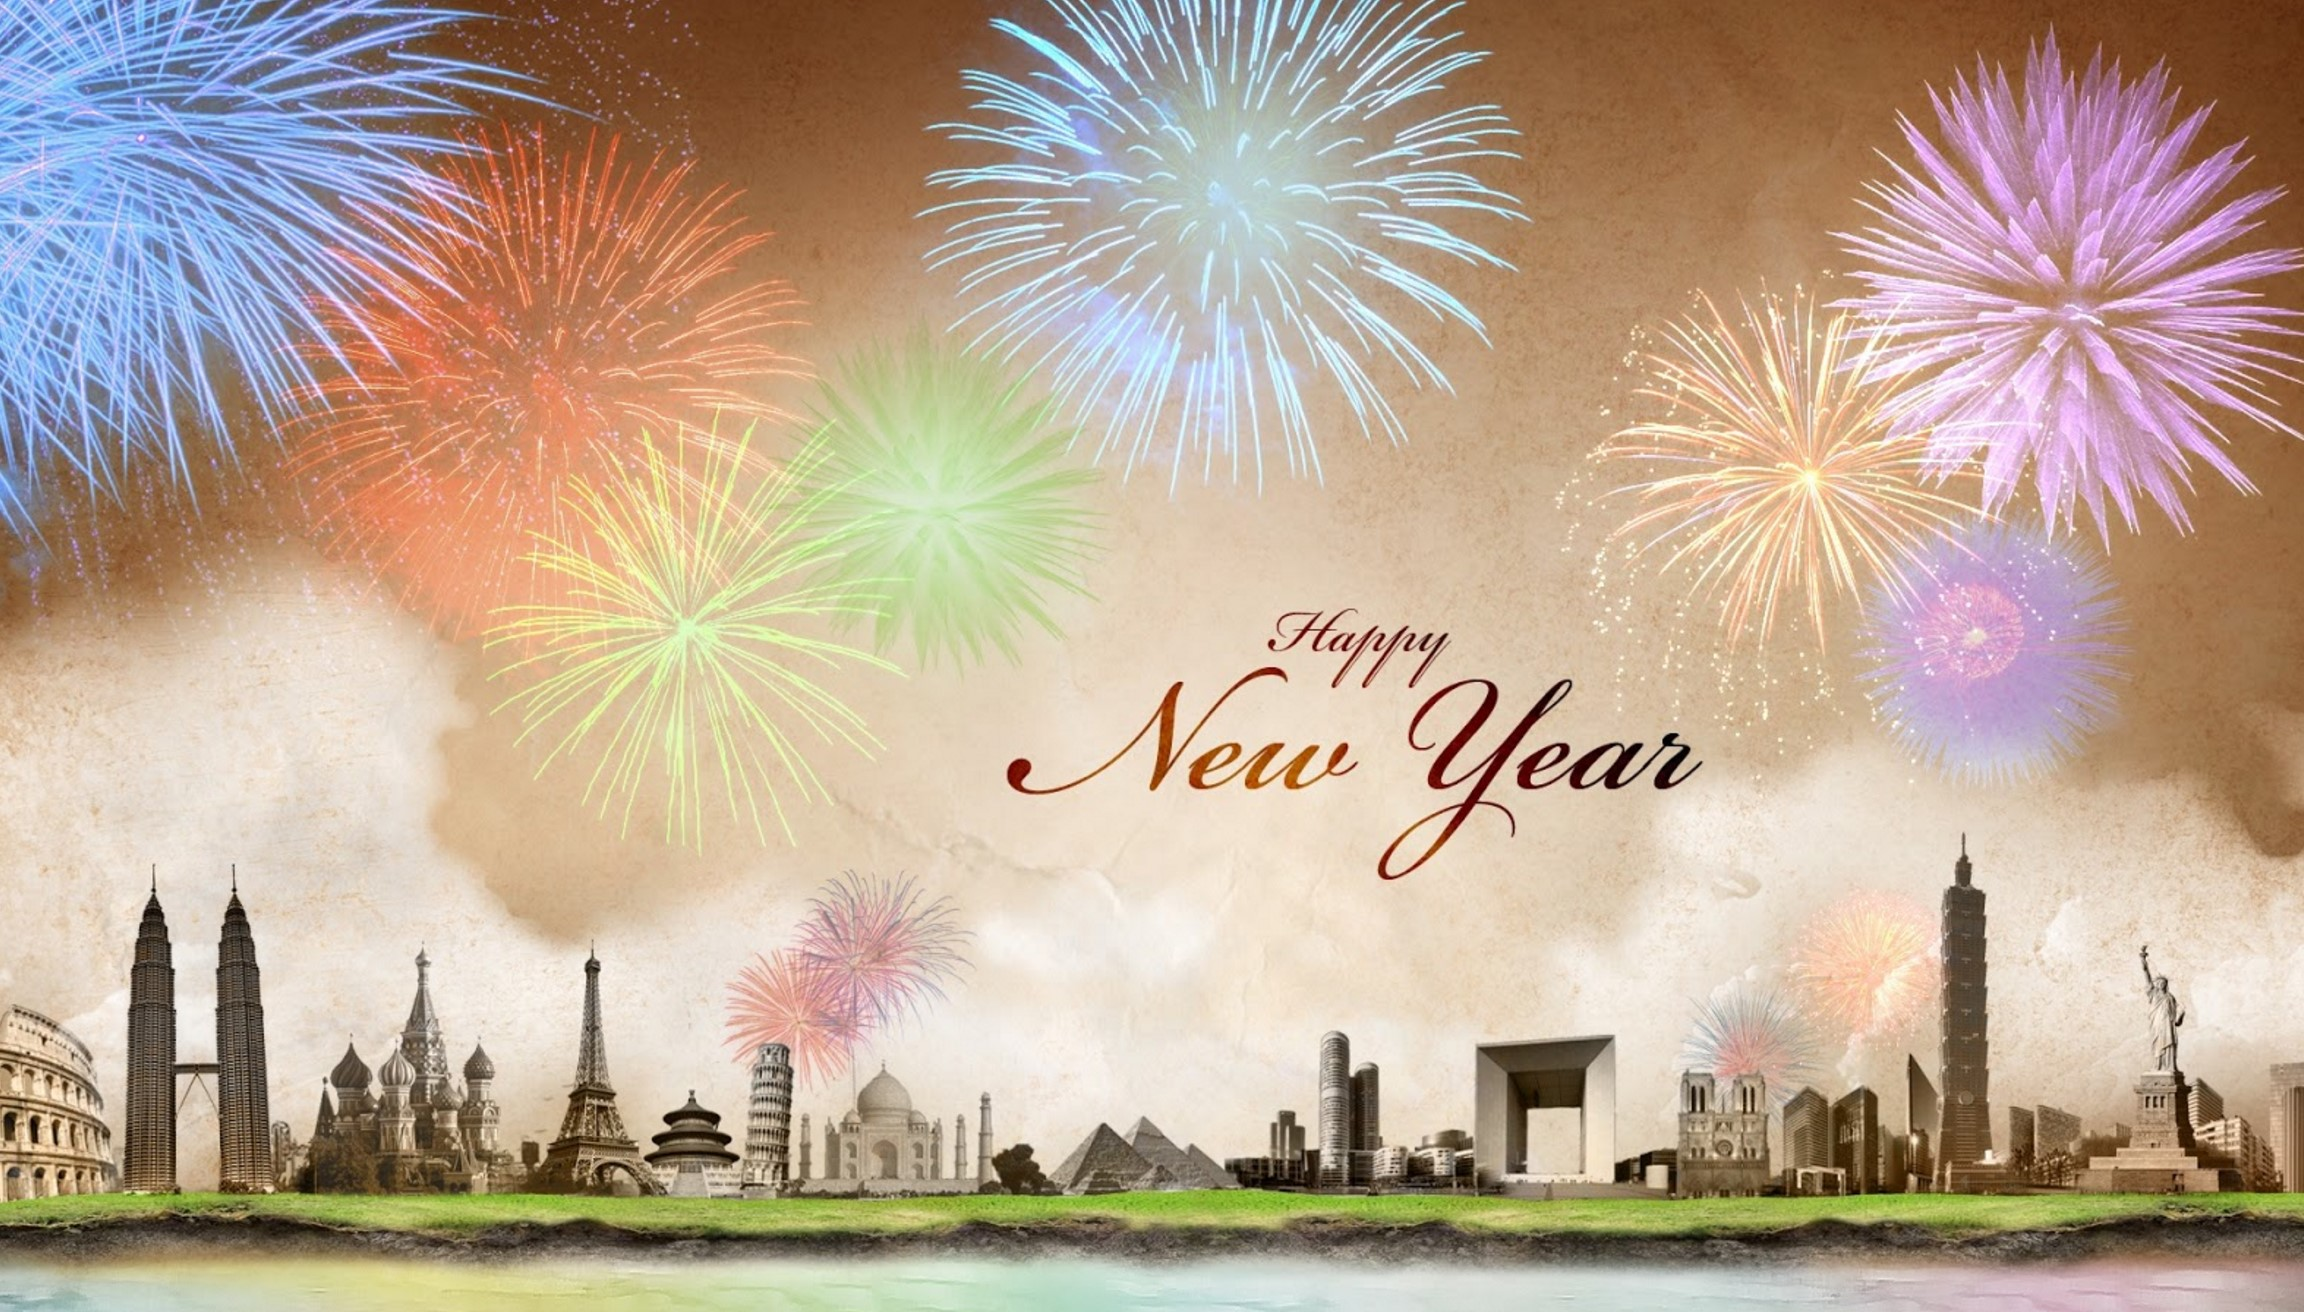 Happy New Year 2018 Crackers Wallpaper